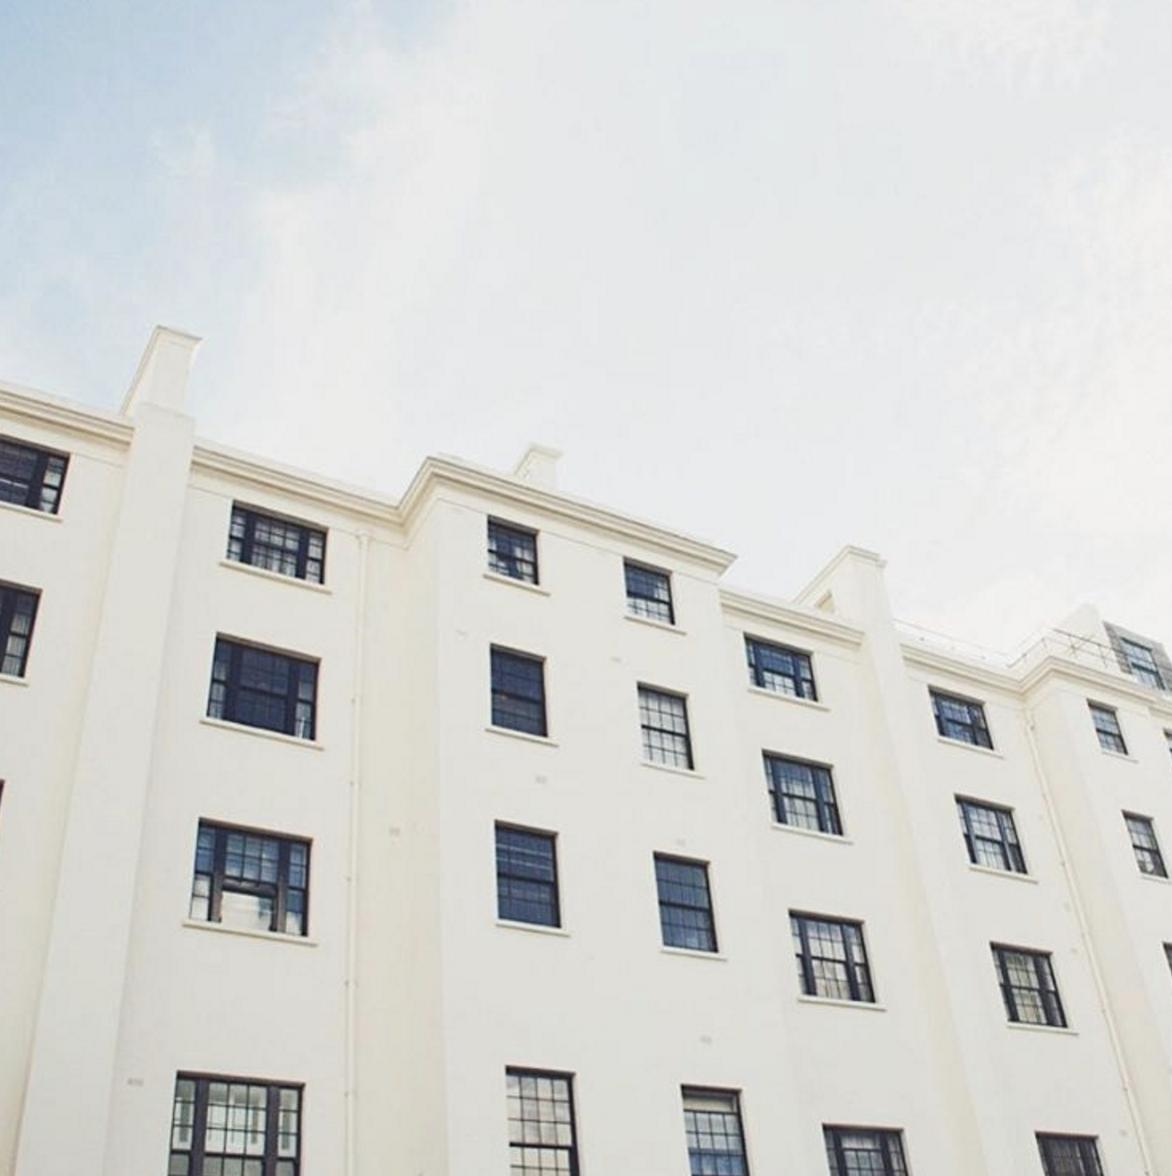 london-buildings